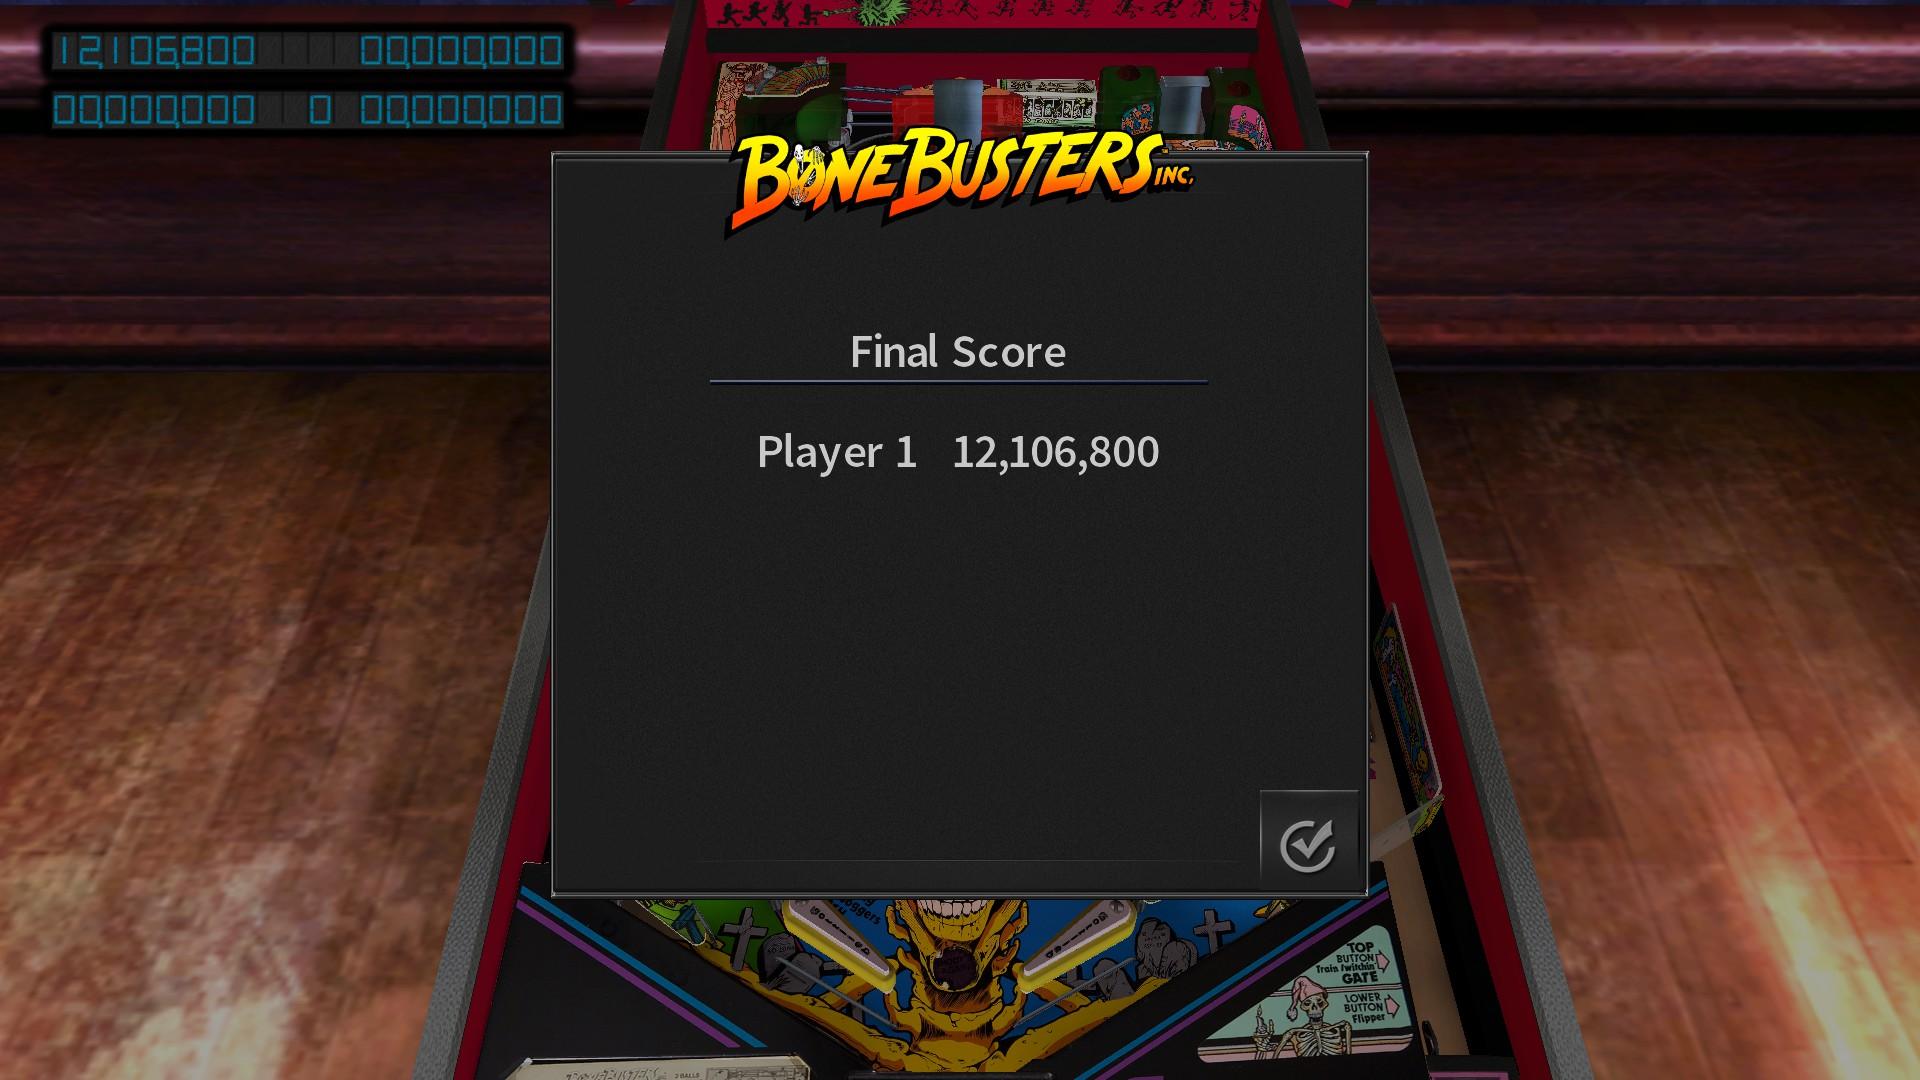 Pinball Arcade: Bone Busters 12,106,800 points